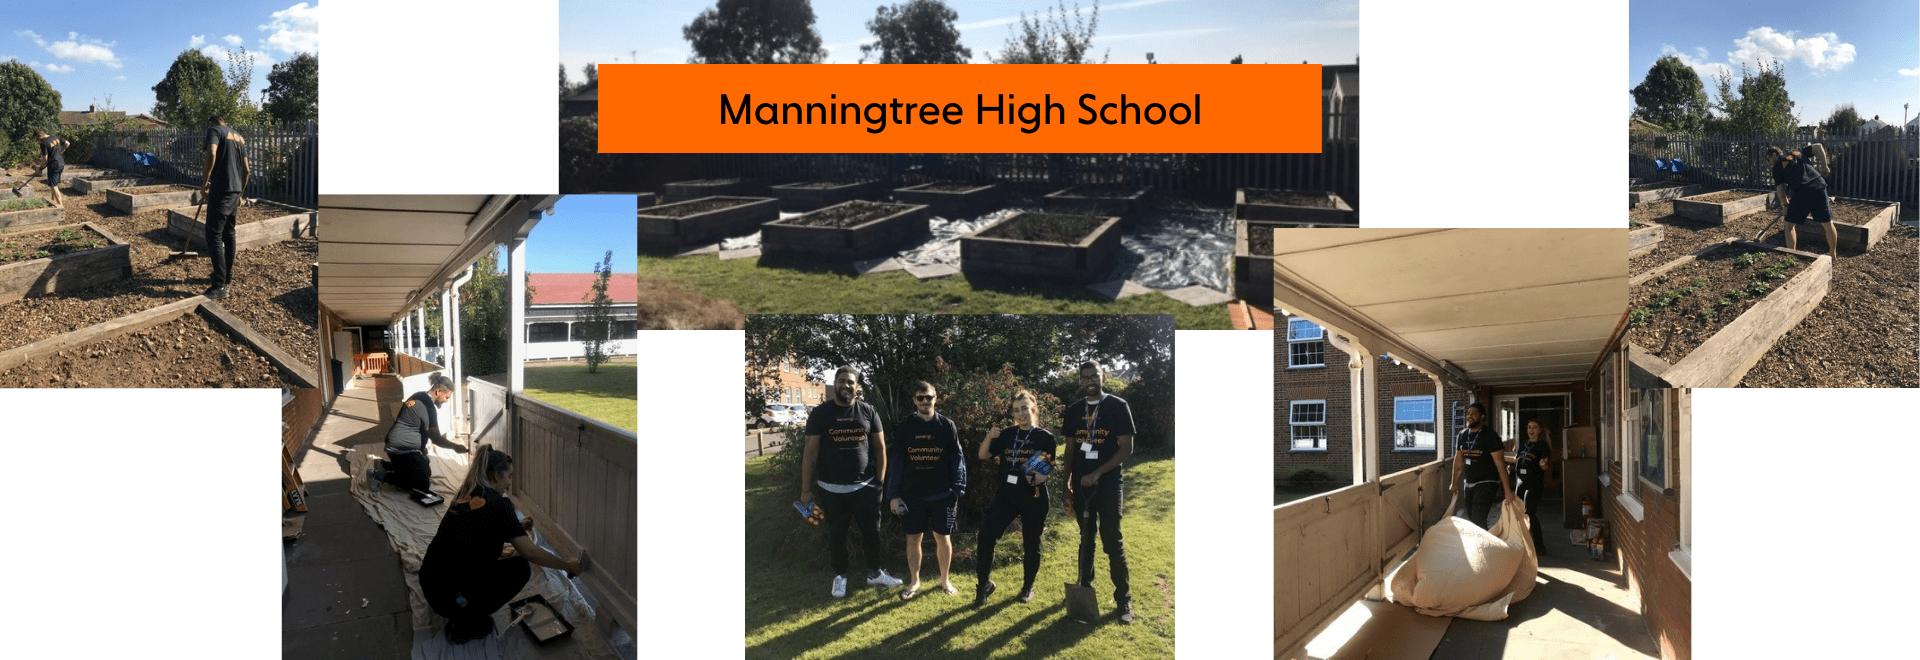 Manningtree High SChool